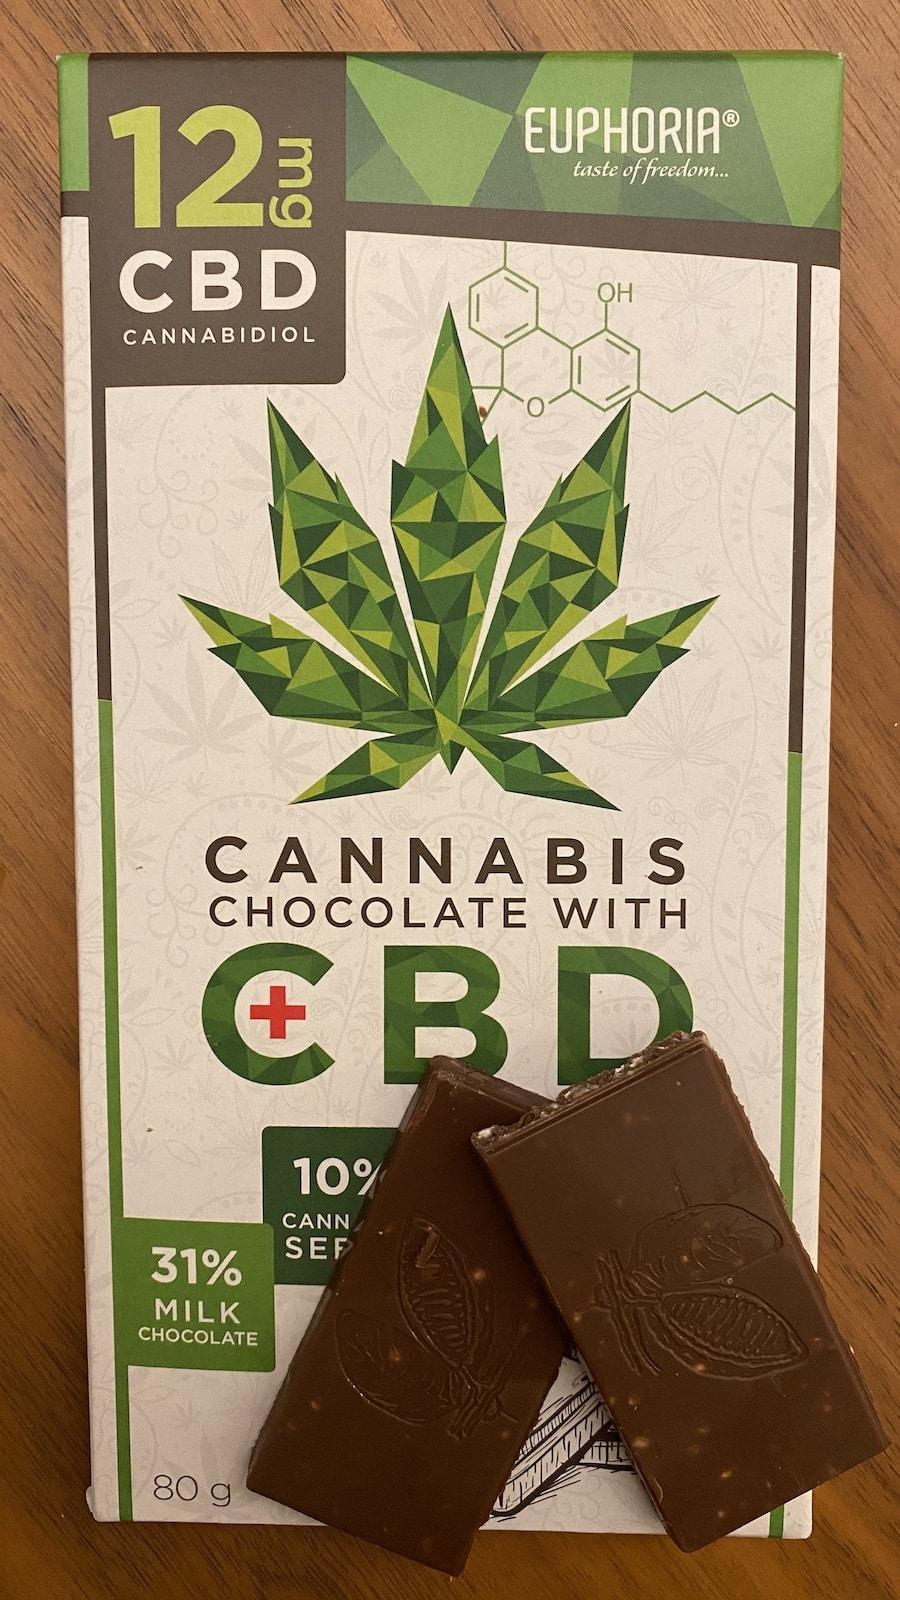 Der Geschmack der CBD Schokolade